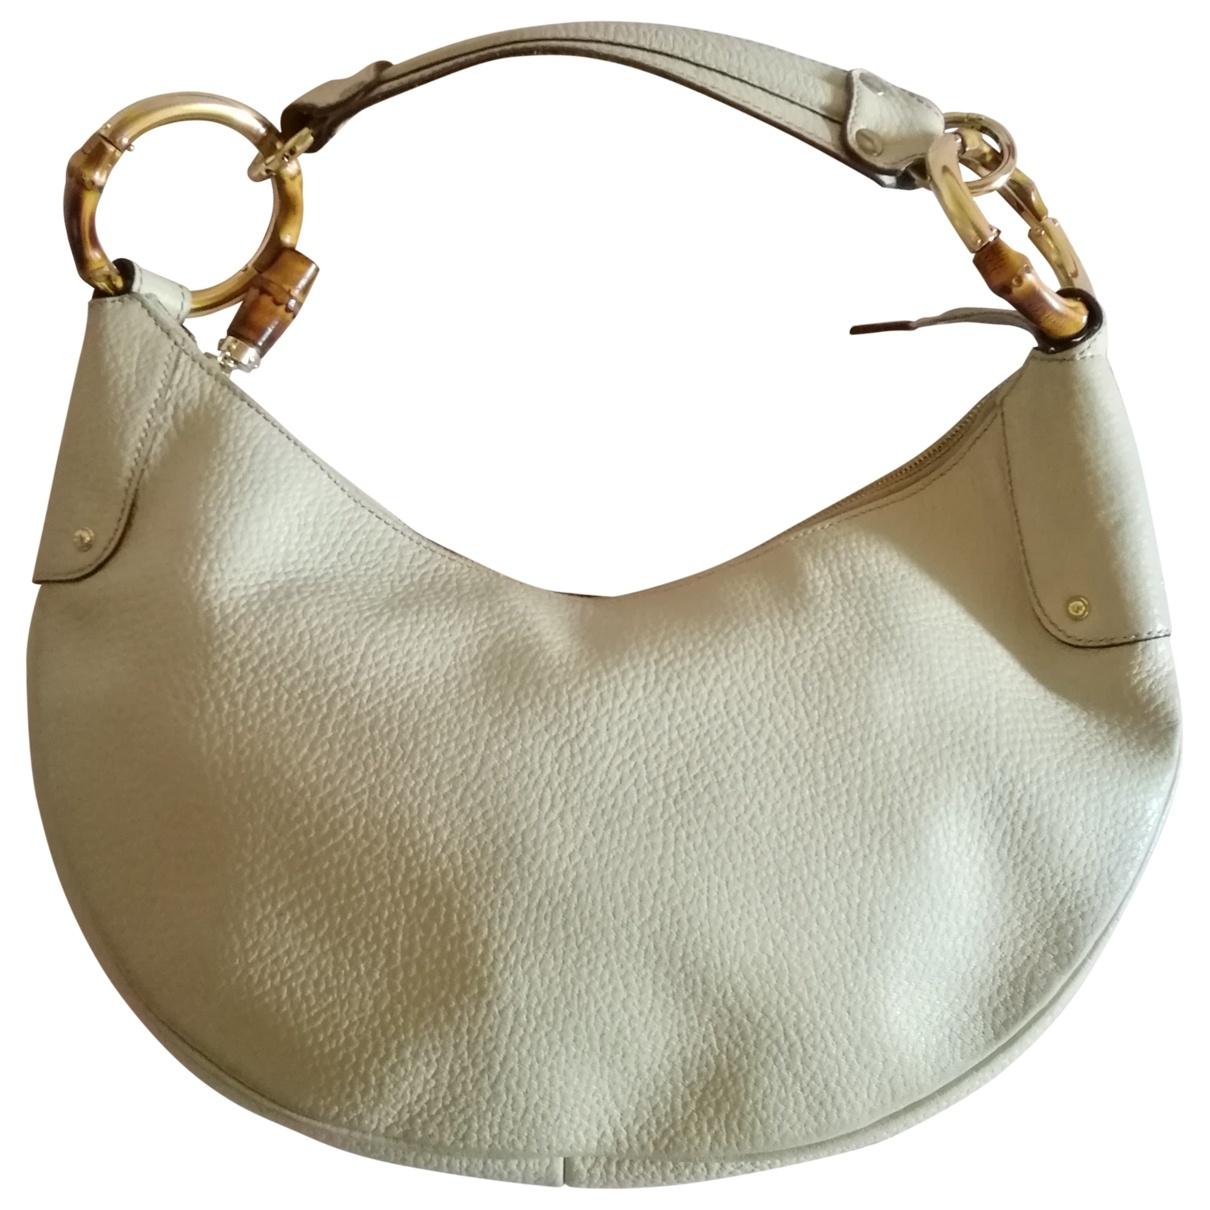 Gucci \N Handtasche in  Ecru Leder